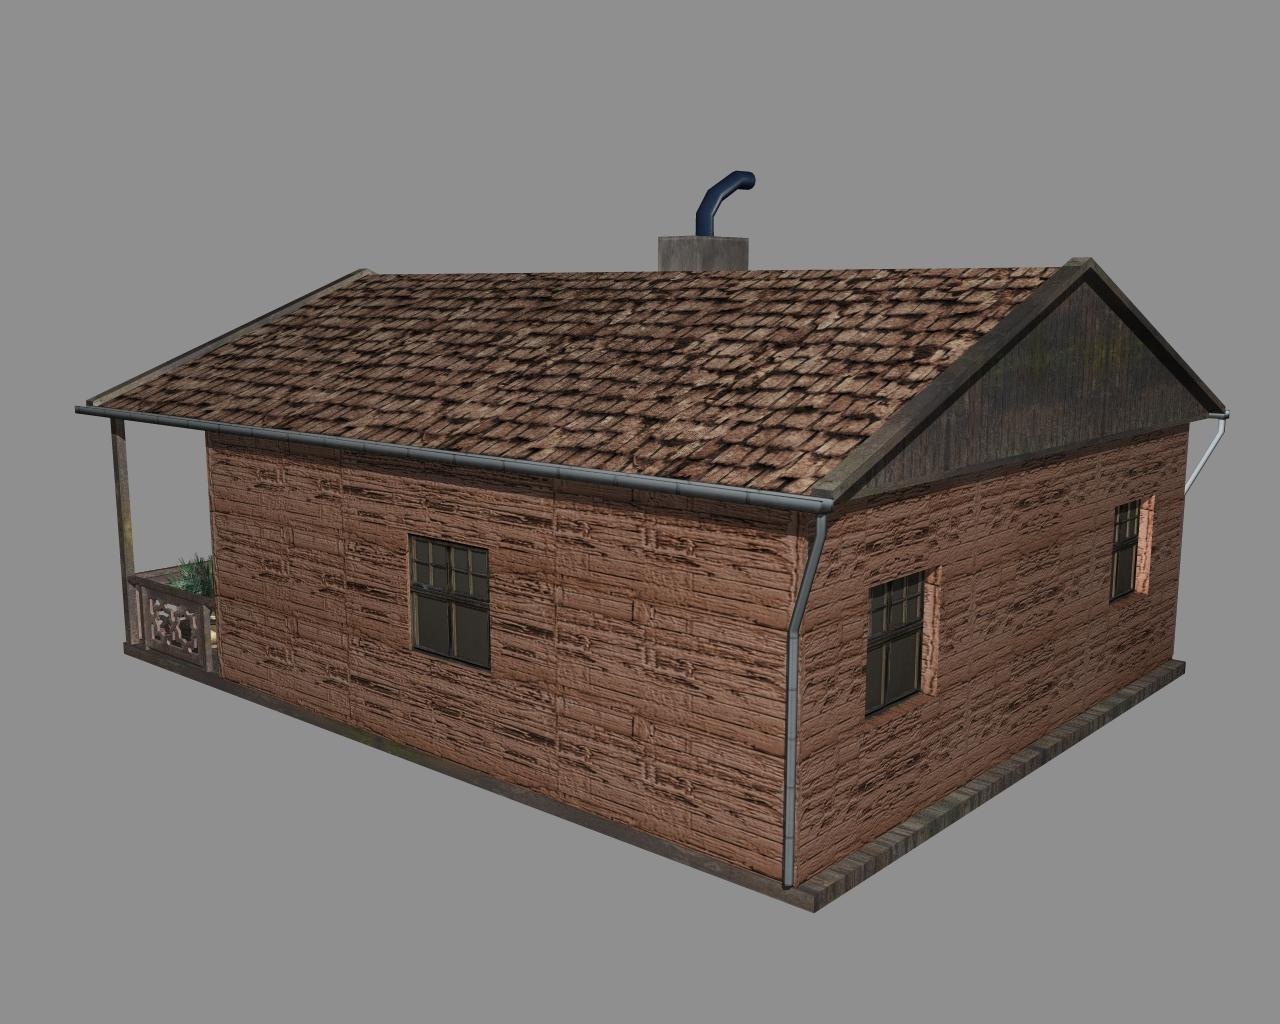 wooden house 2 3d model 3ds 166193